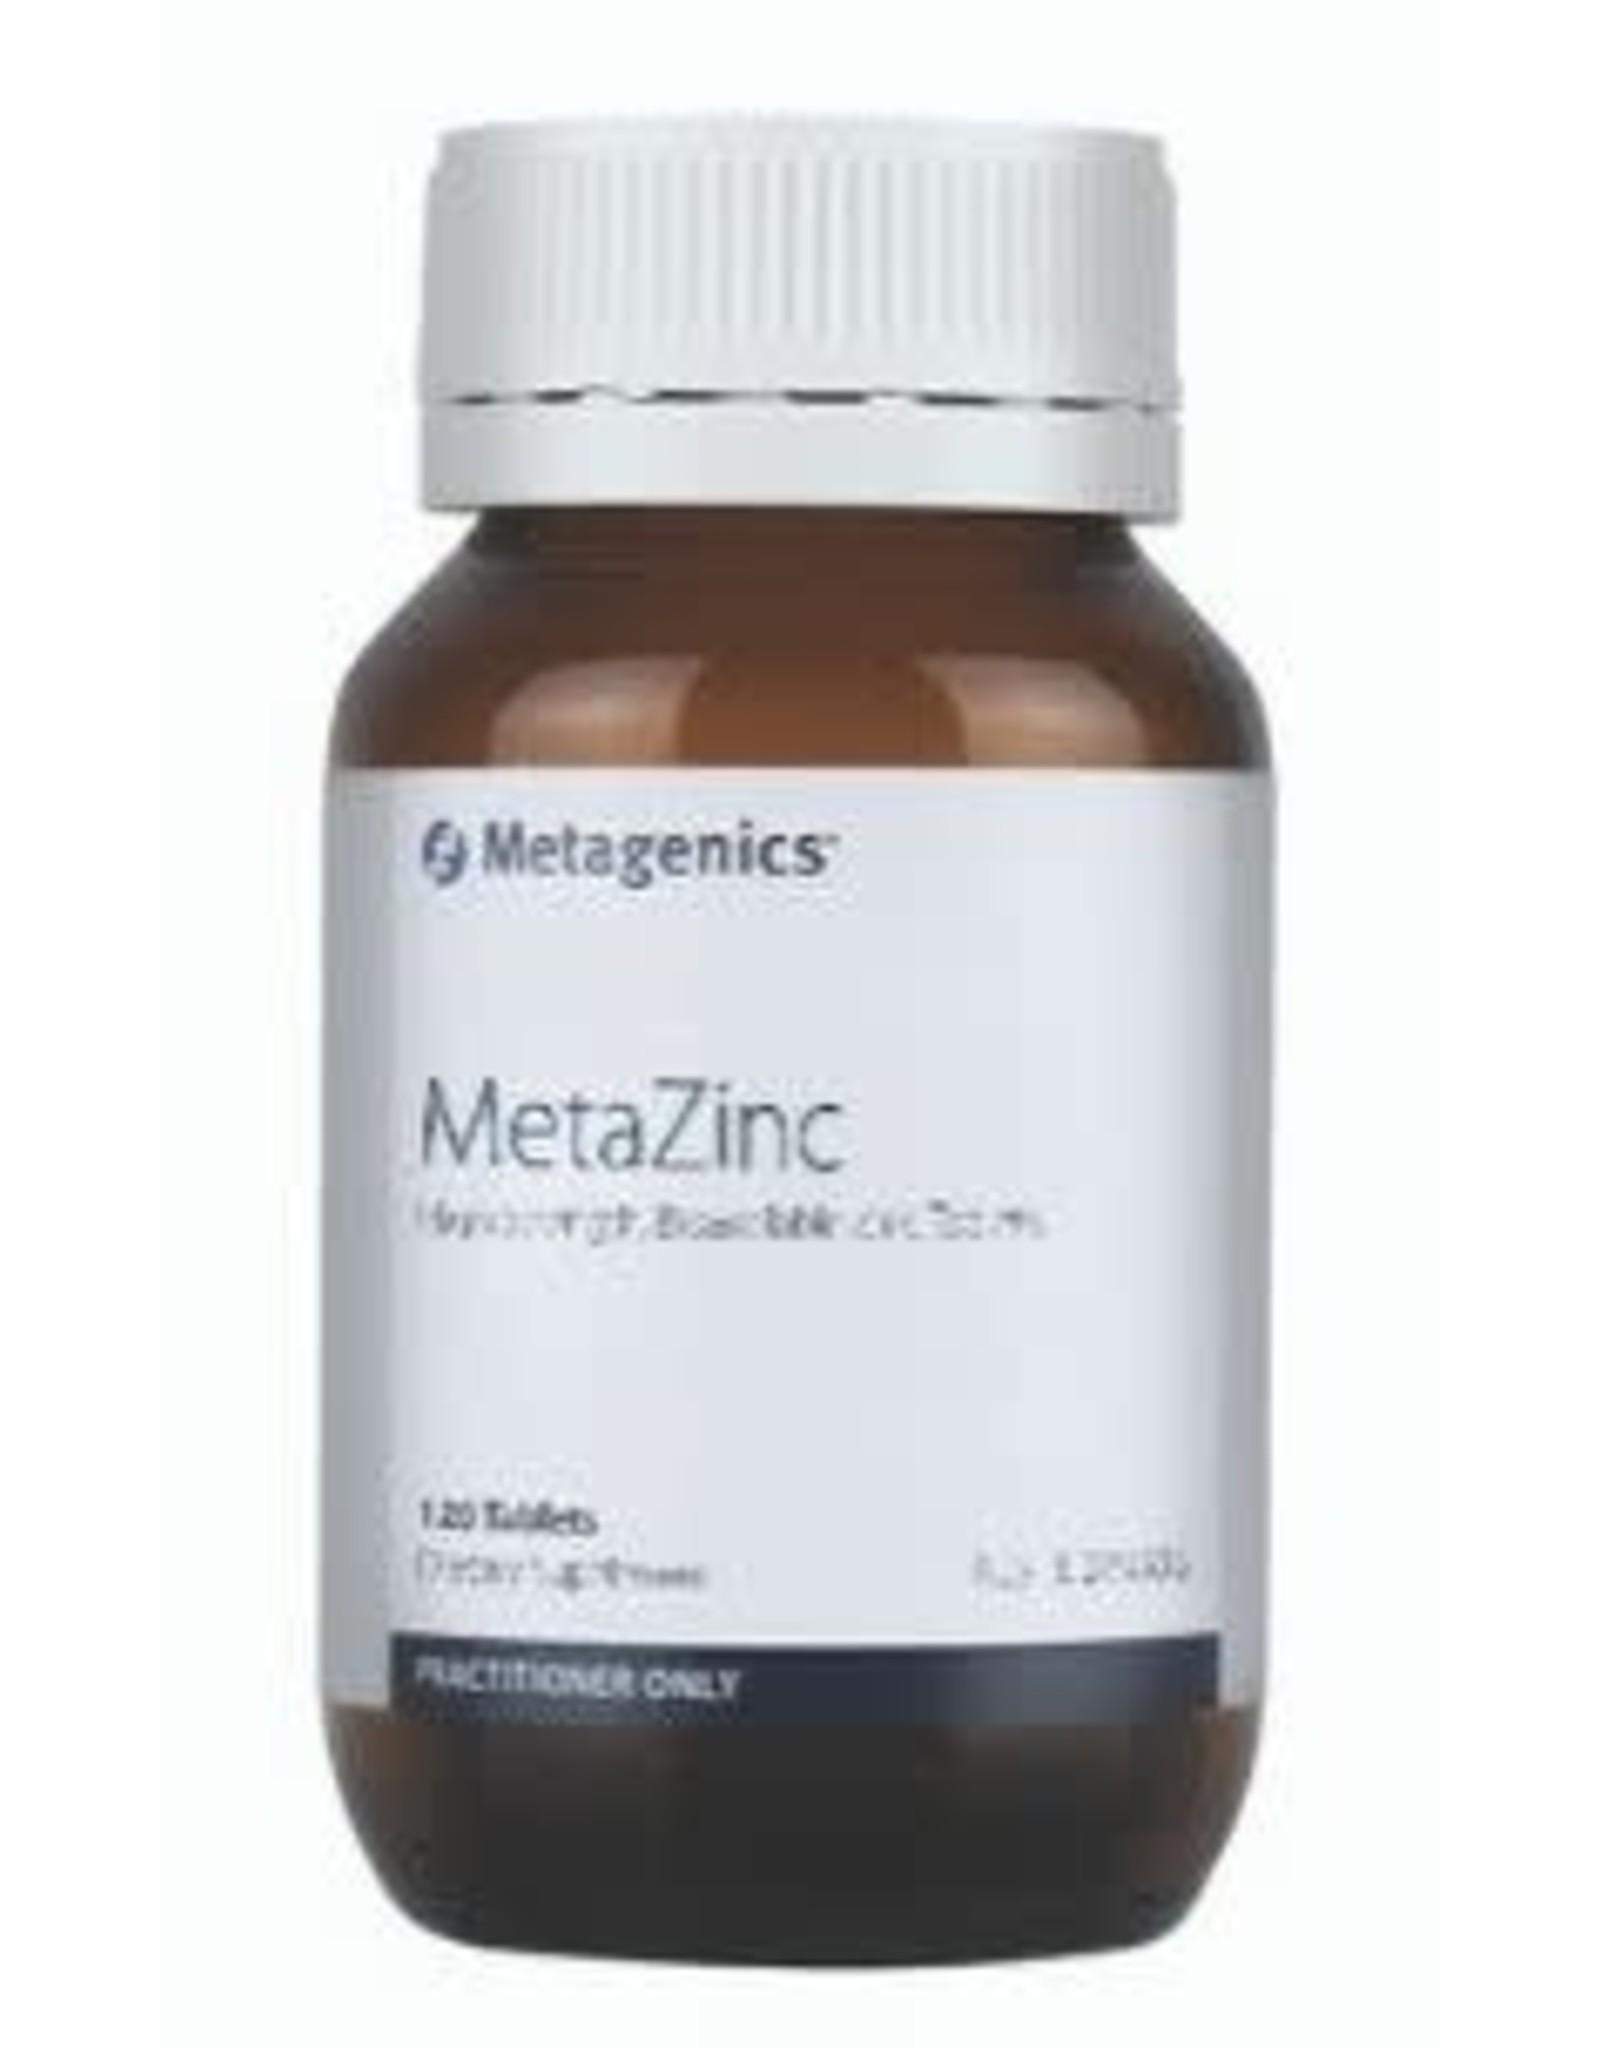 Metagenics MetaZinc 120t